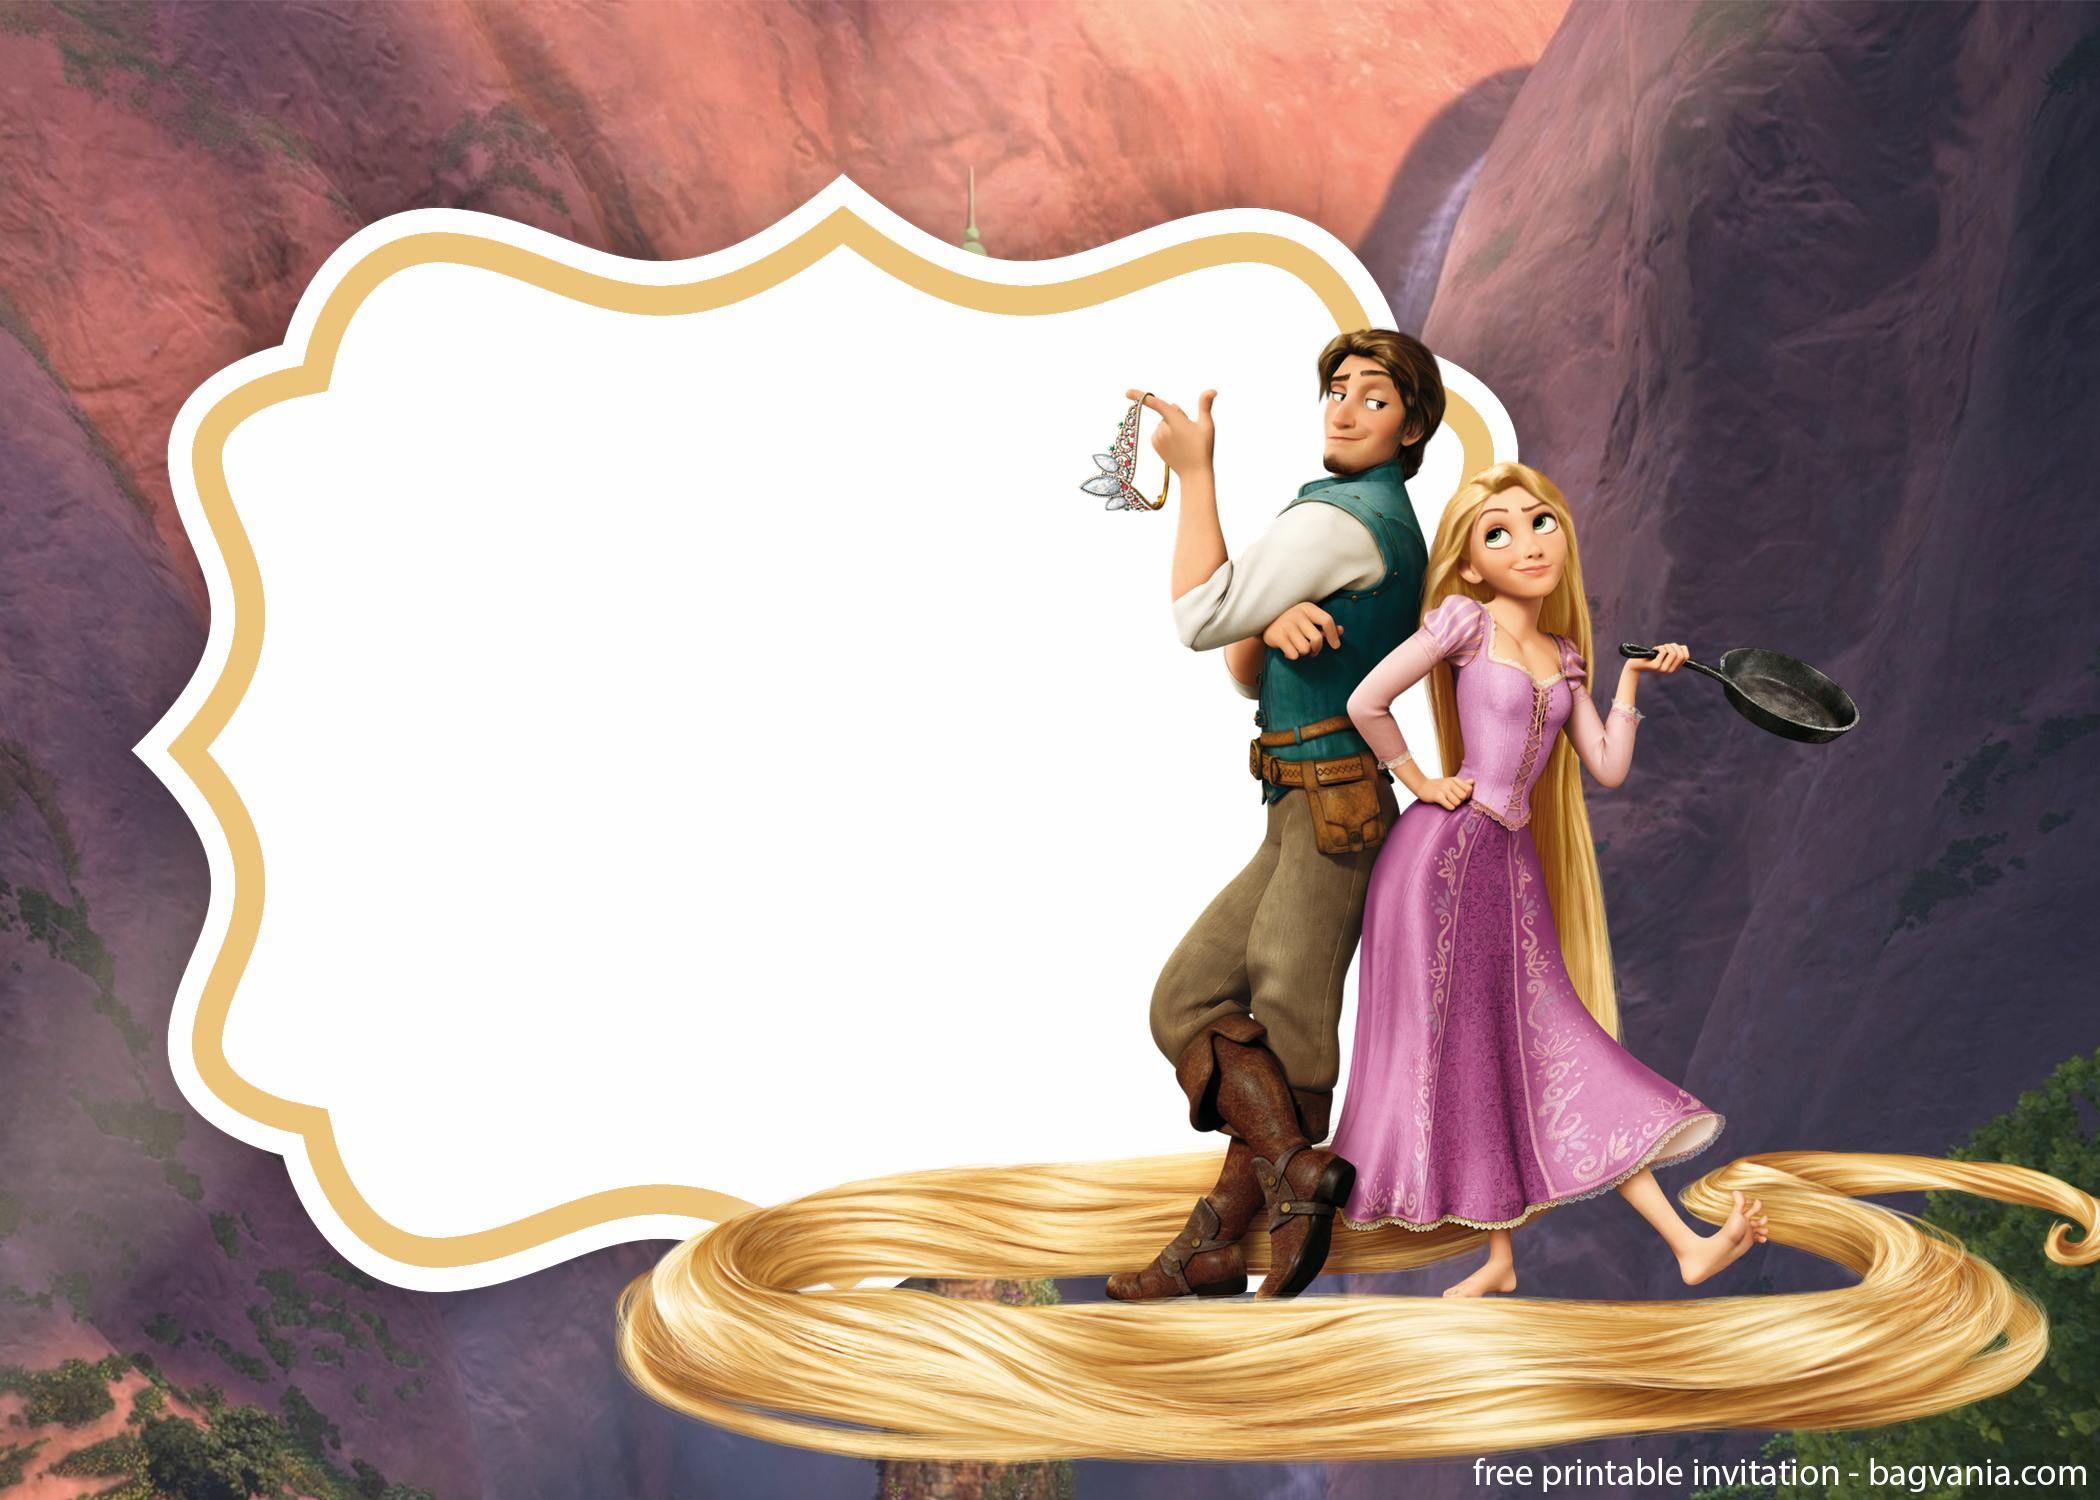 Free Royal Rapunzel Invitation Template Rapunzel Invitations Printable Birthday Invitations Birthday Invitation Templates